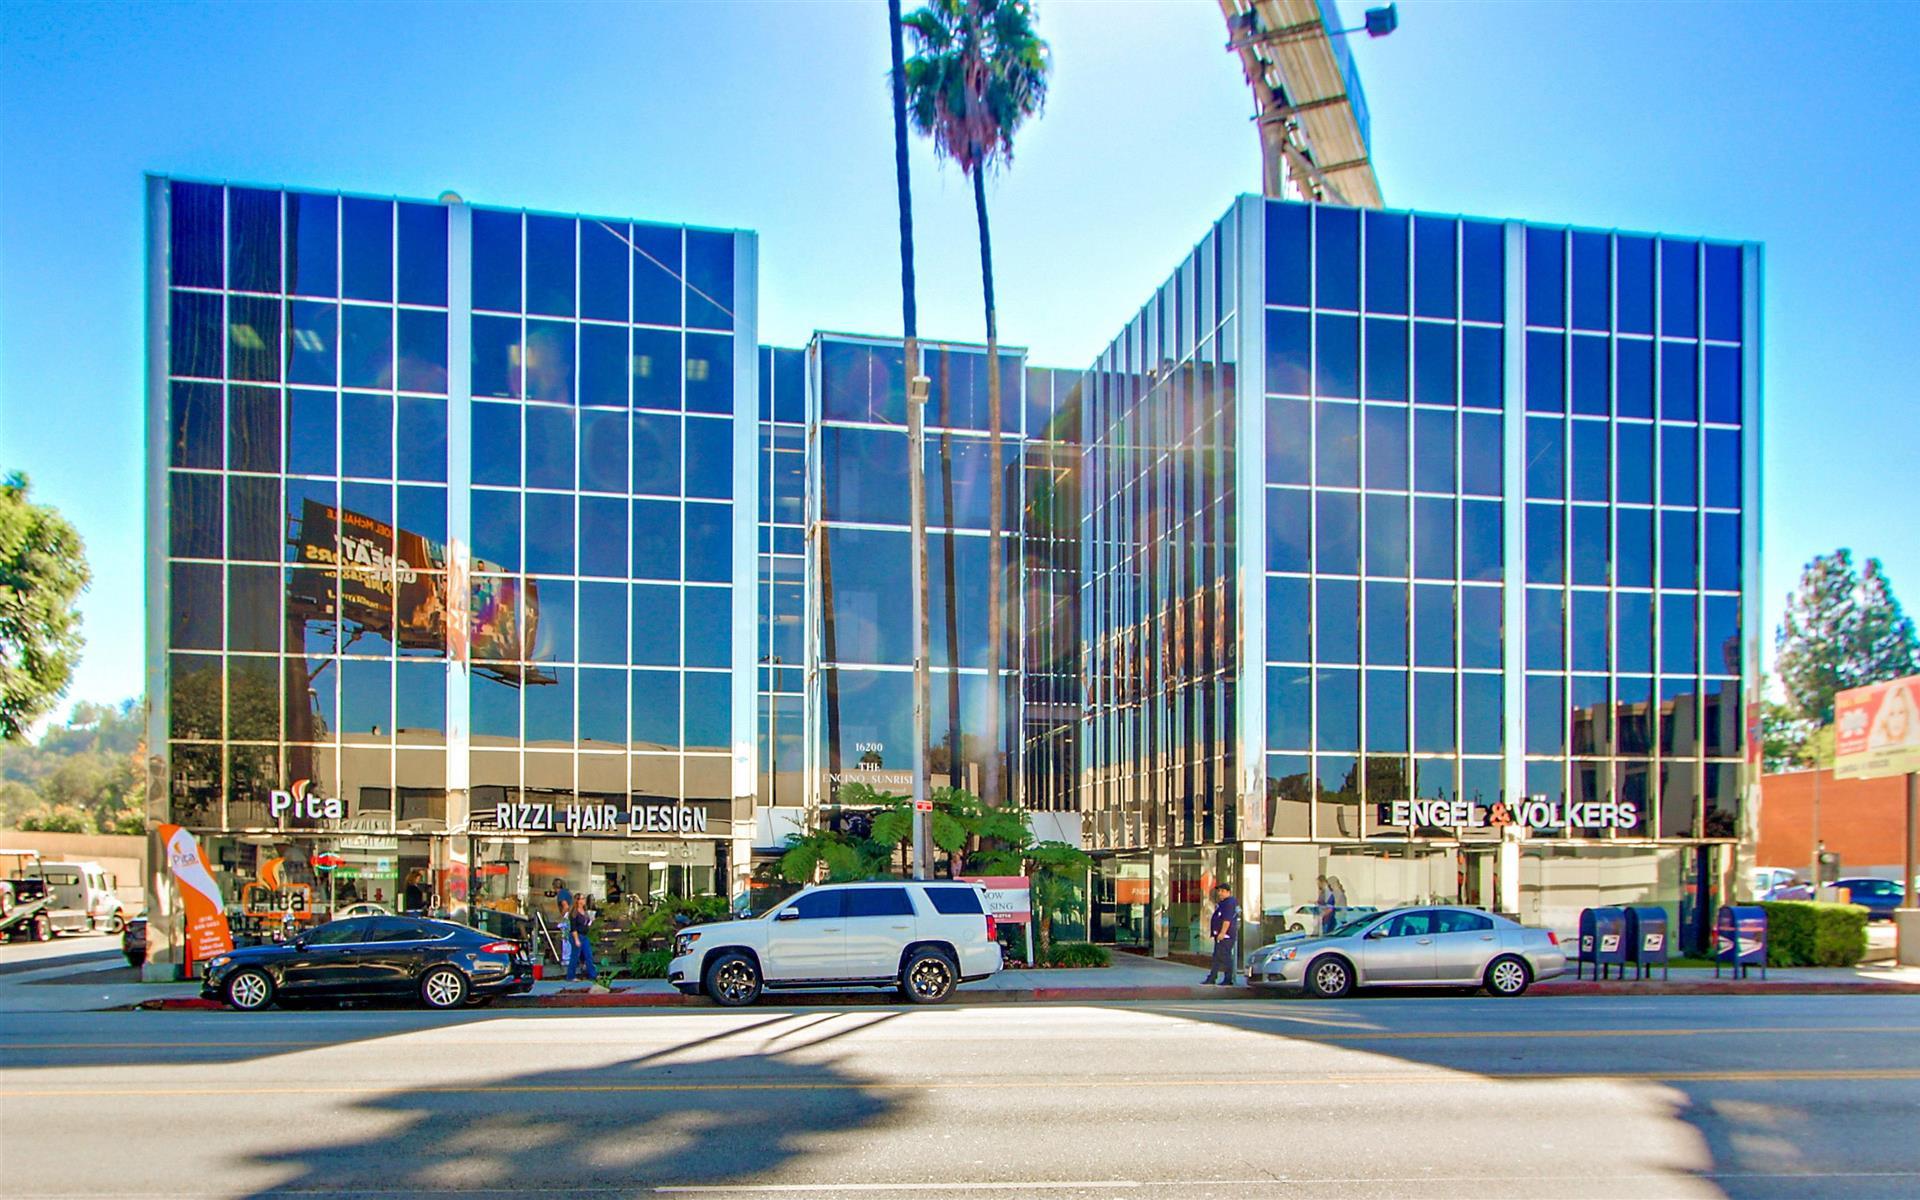 16200 Ventura Blvd. - Suite 306 - 4-room Team Office